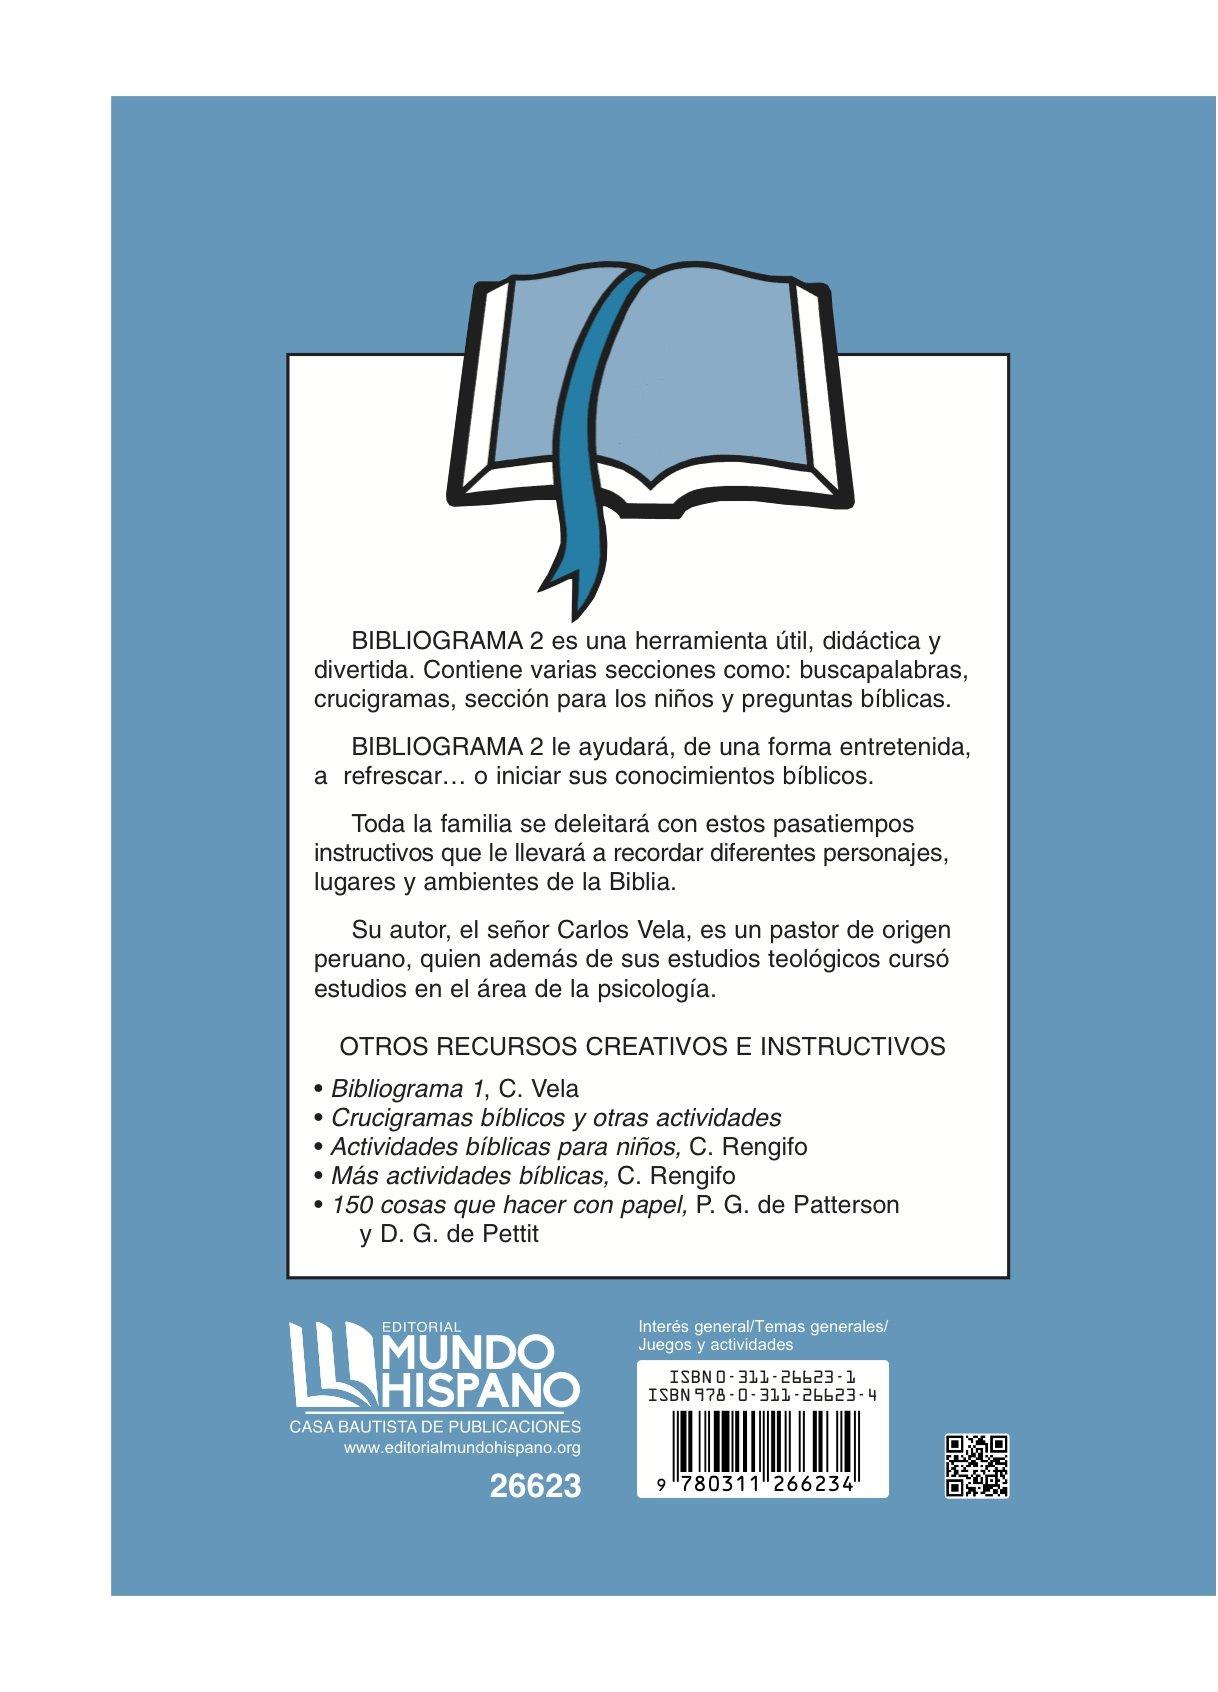 Bibliograma 2 Spanish Edition Carlos Vela 9780311266234 Amazon